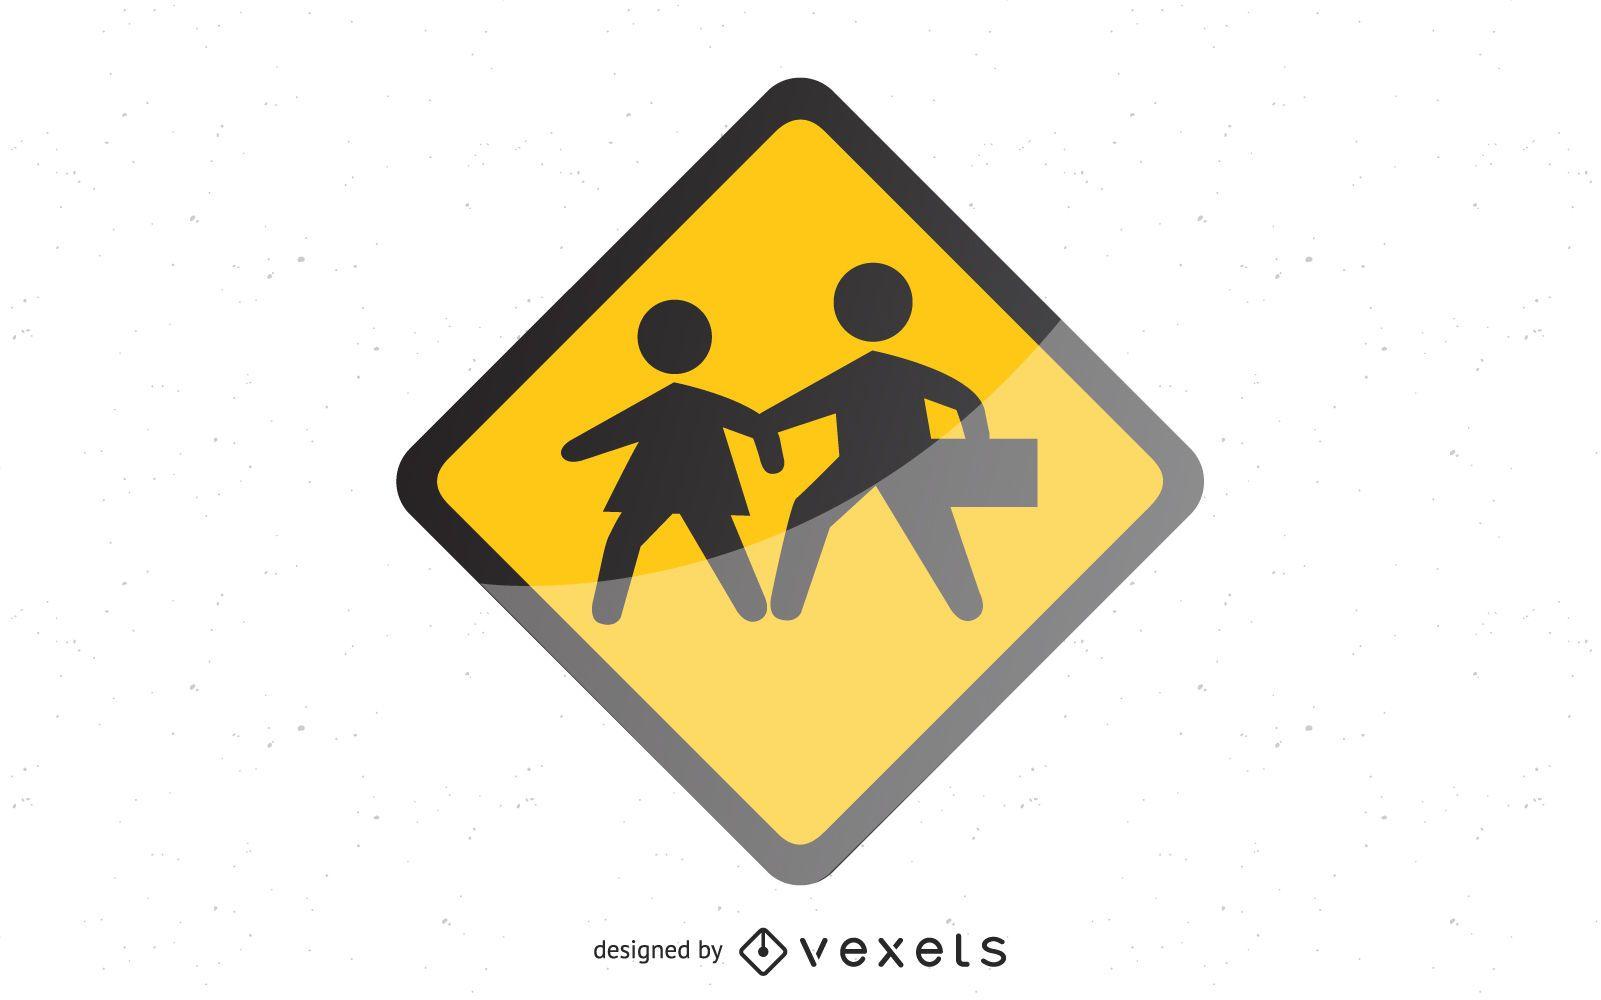 Glossy shiny school signs